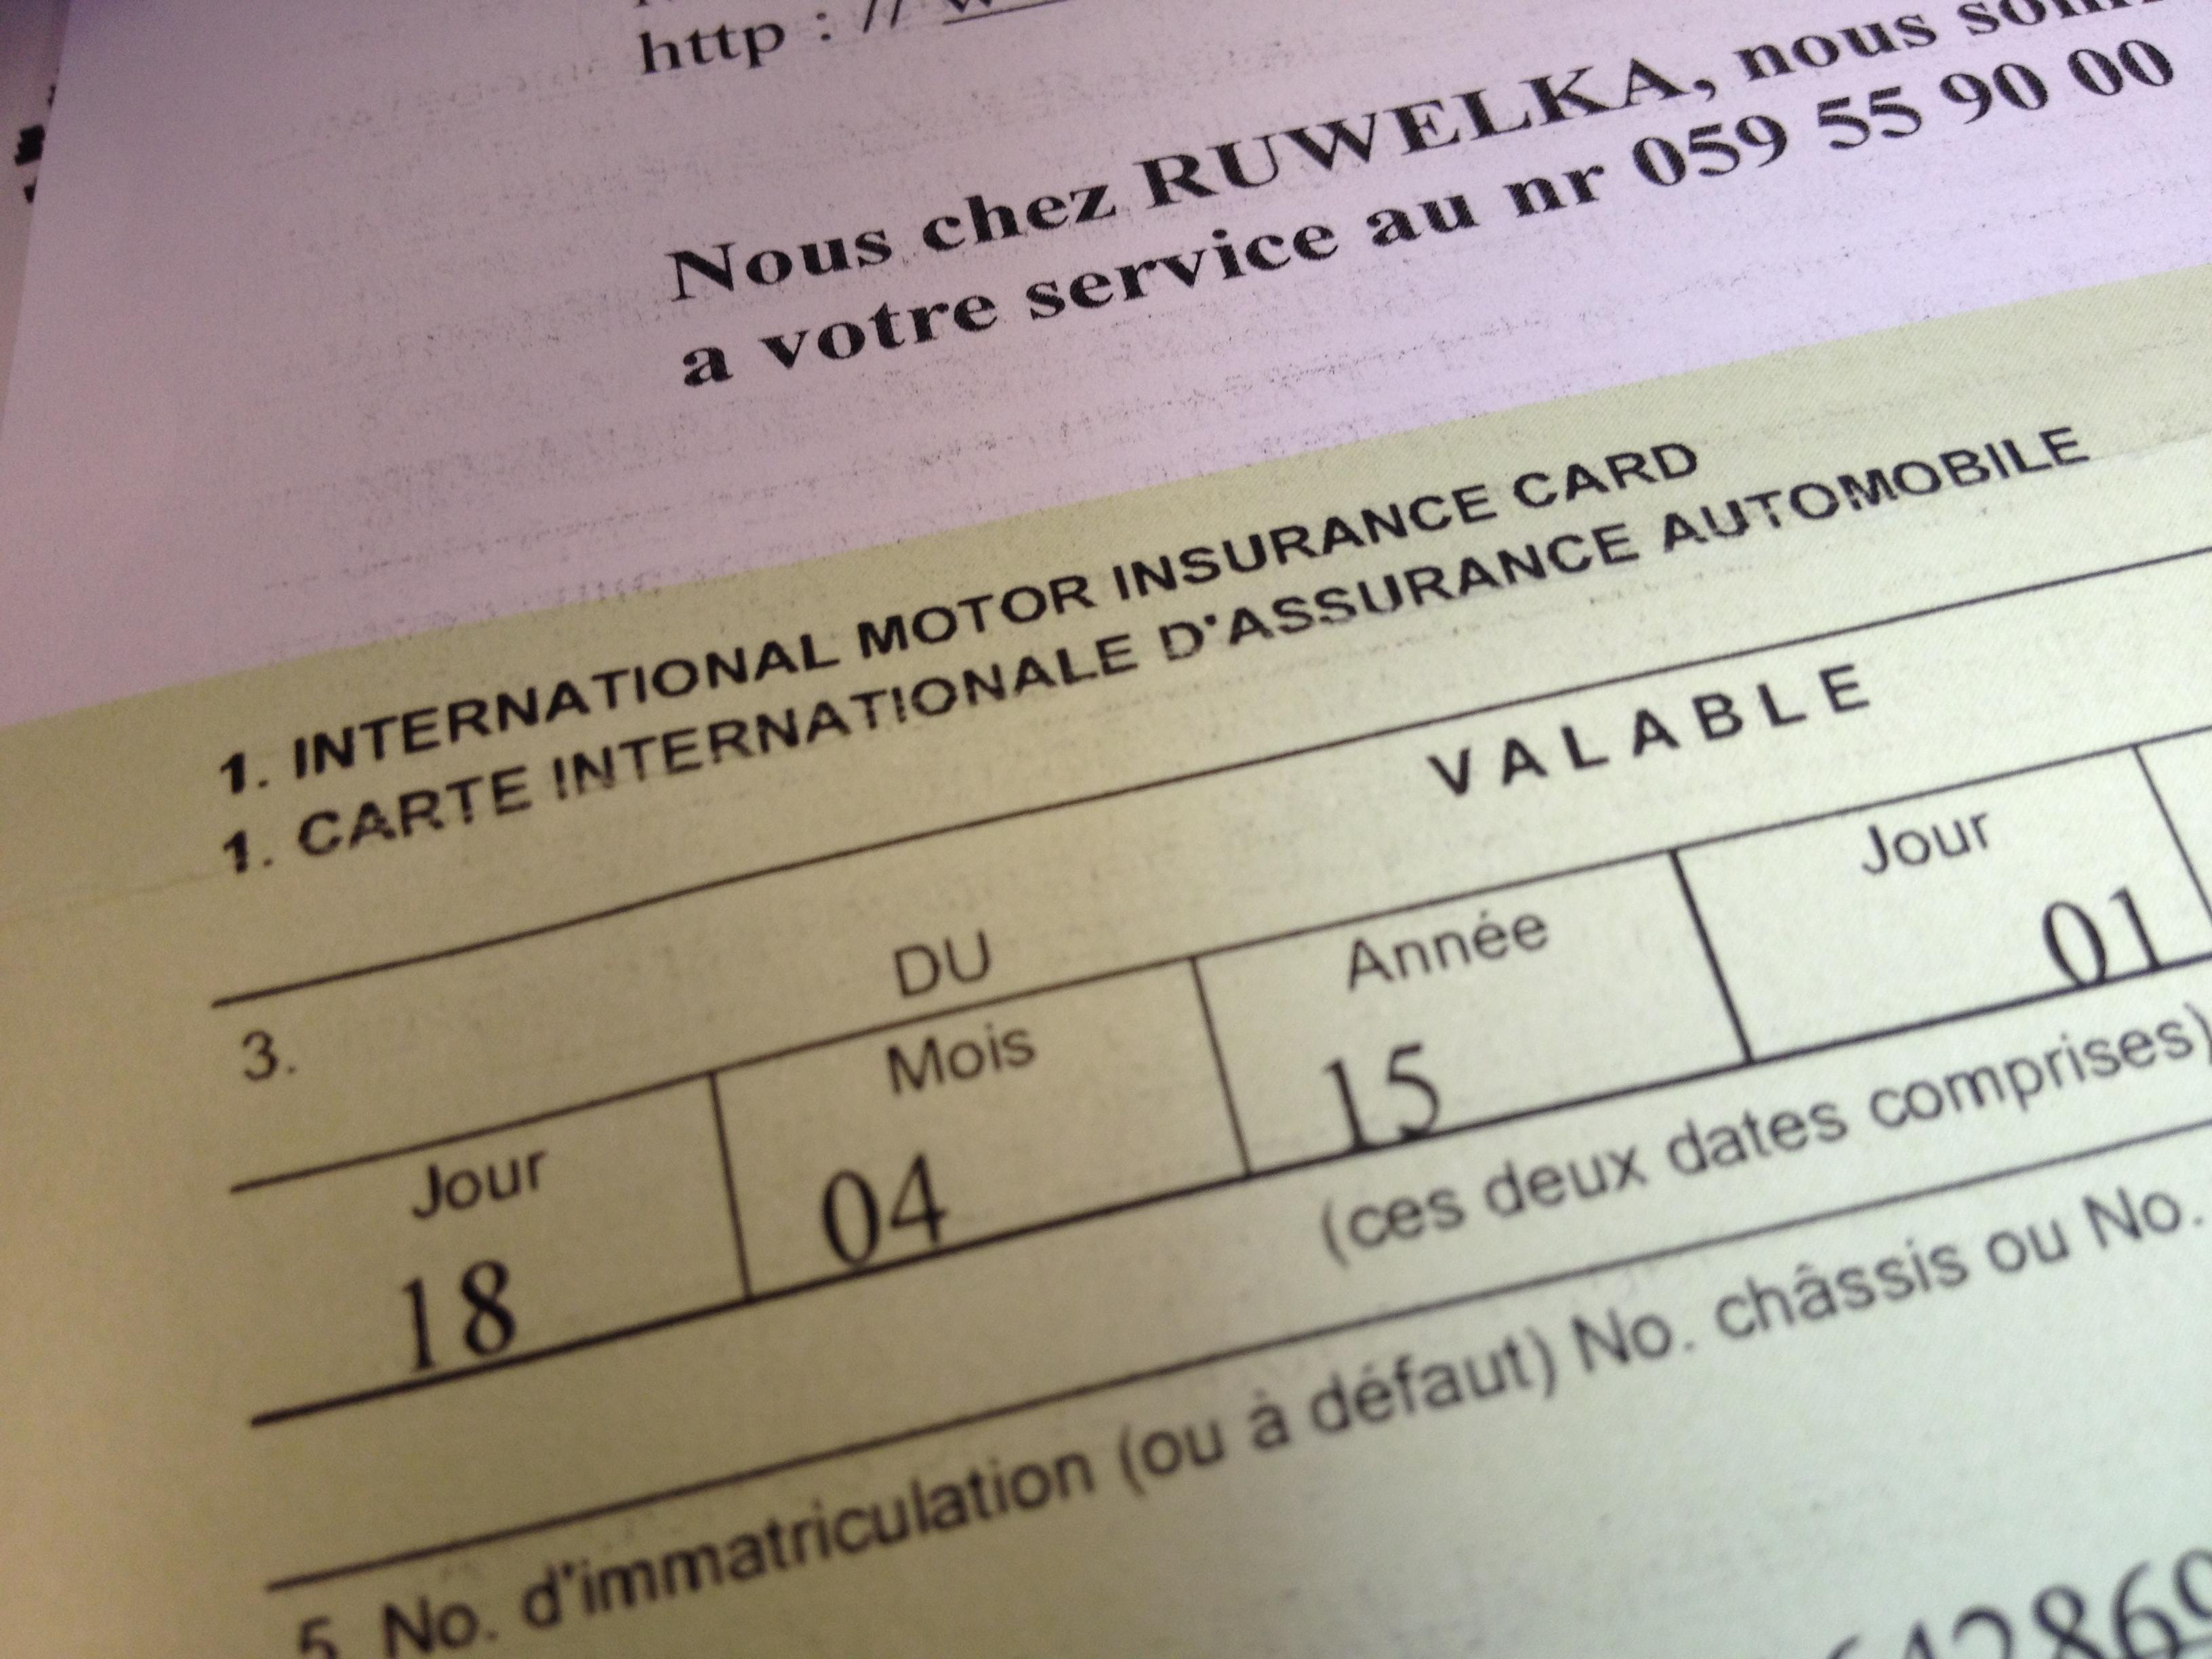 Temporary Insurance Card